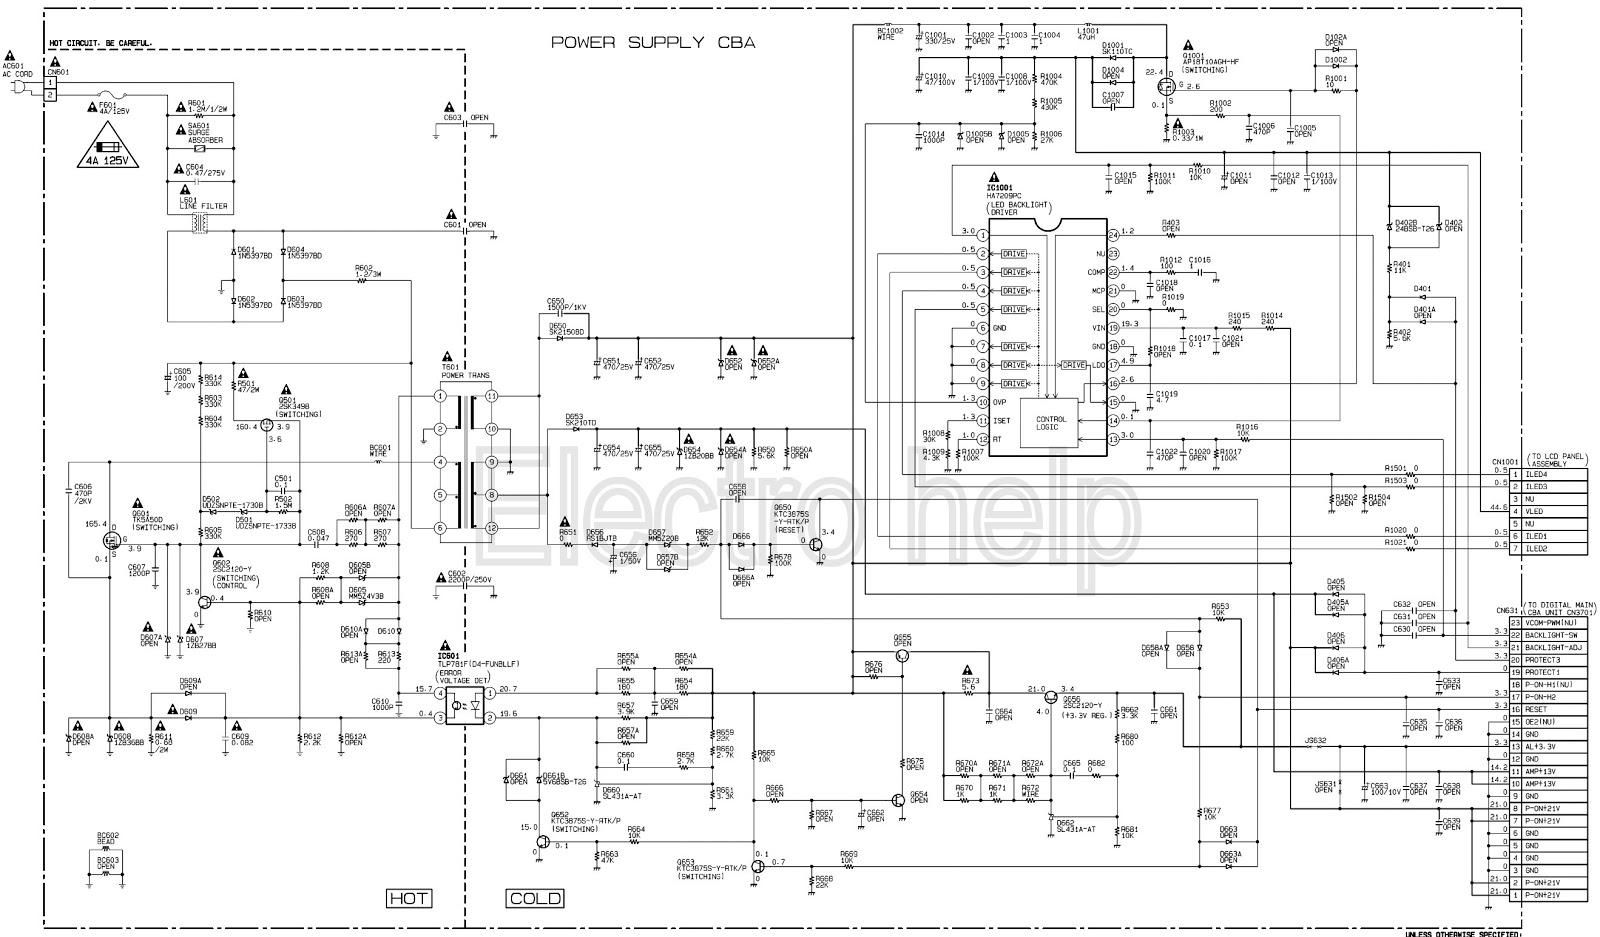 EMERSON LE220EM3  22ME402VF7 MAGNAVOX LED LCD TV POWER